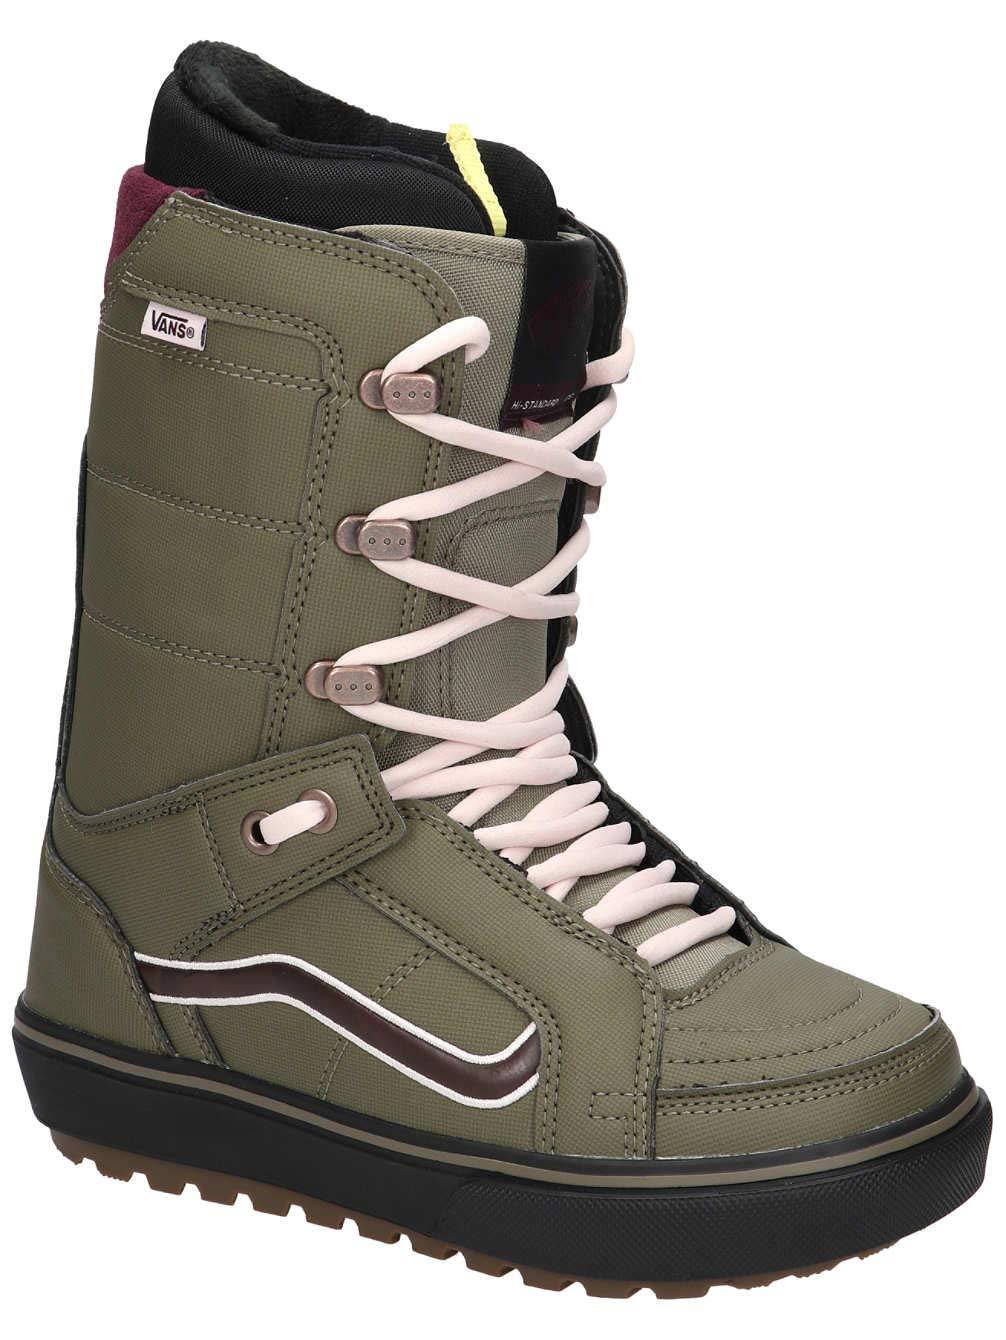 Vans hi standard og women snowboard boots green burgundy us sports outdoors  jpg 1006x1340 Vans winter deb28cc86